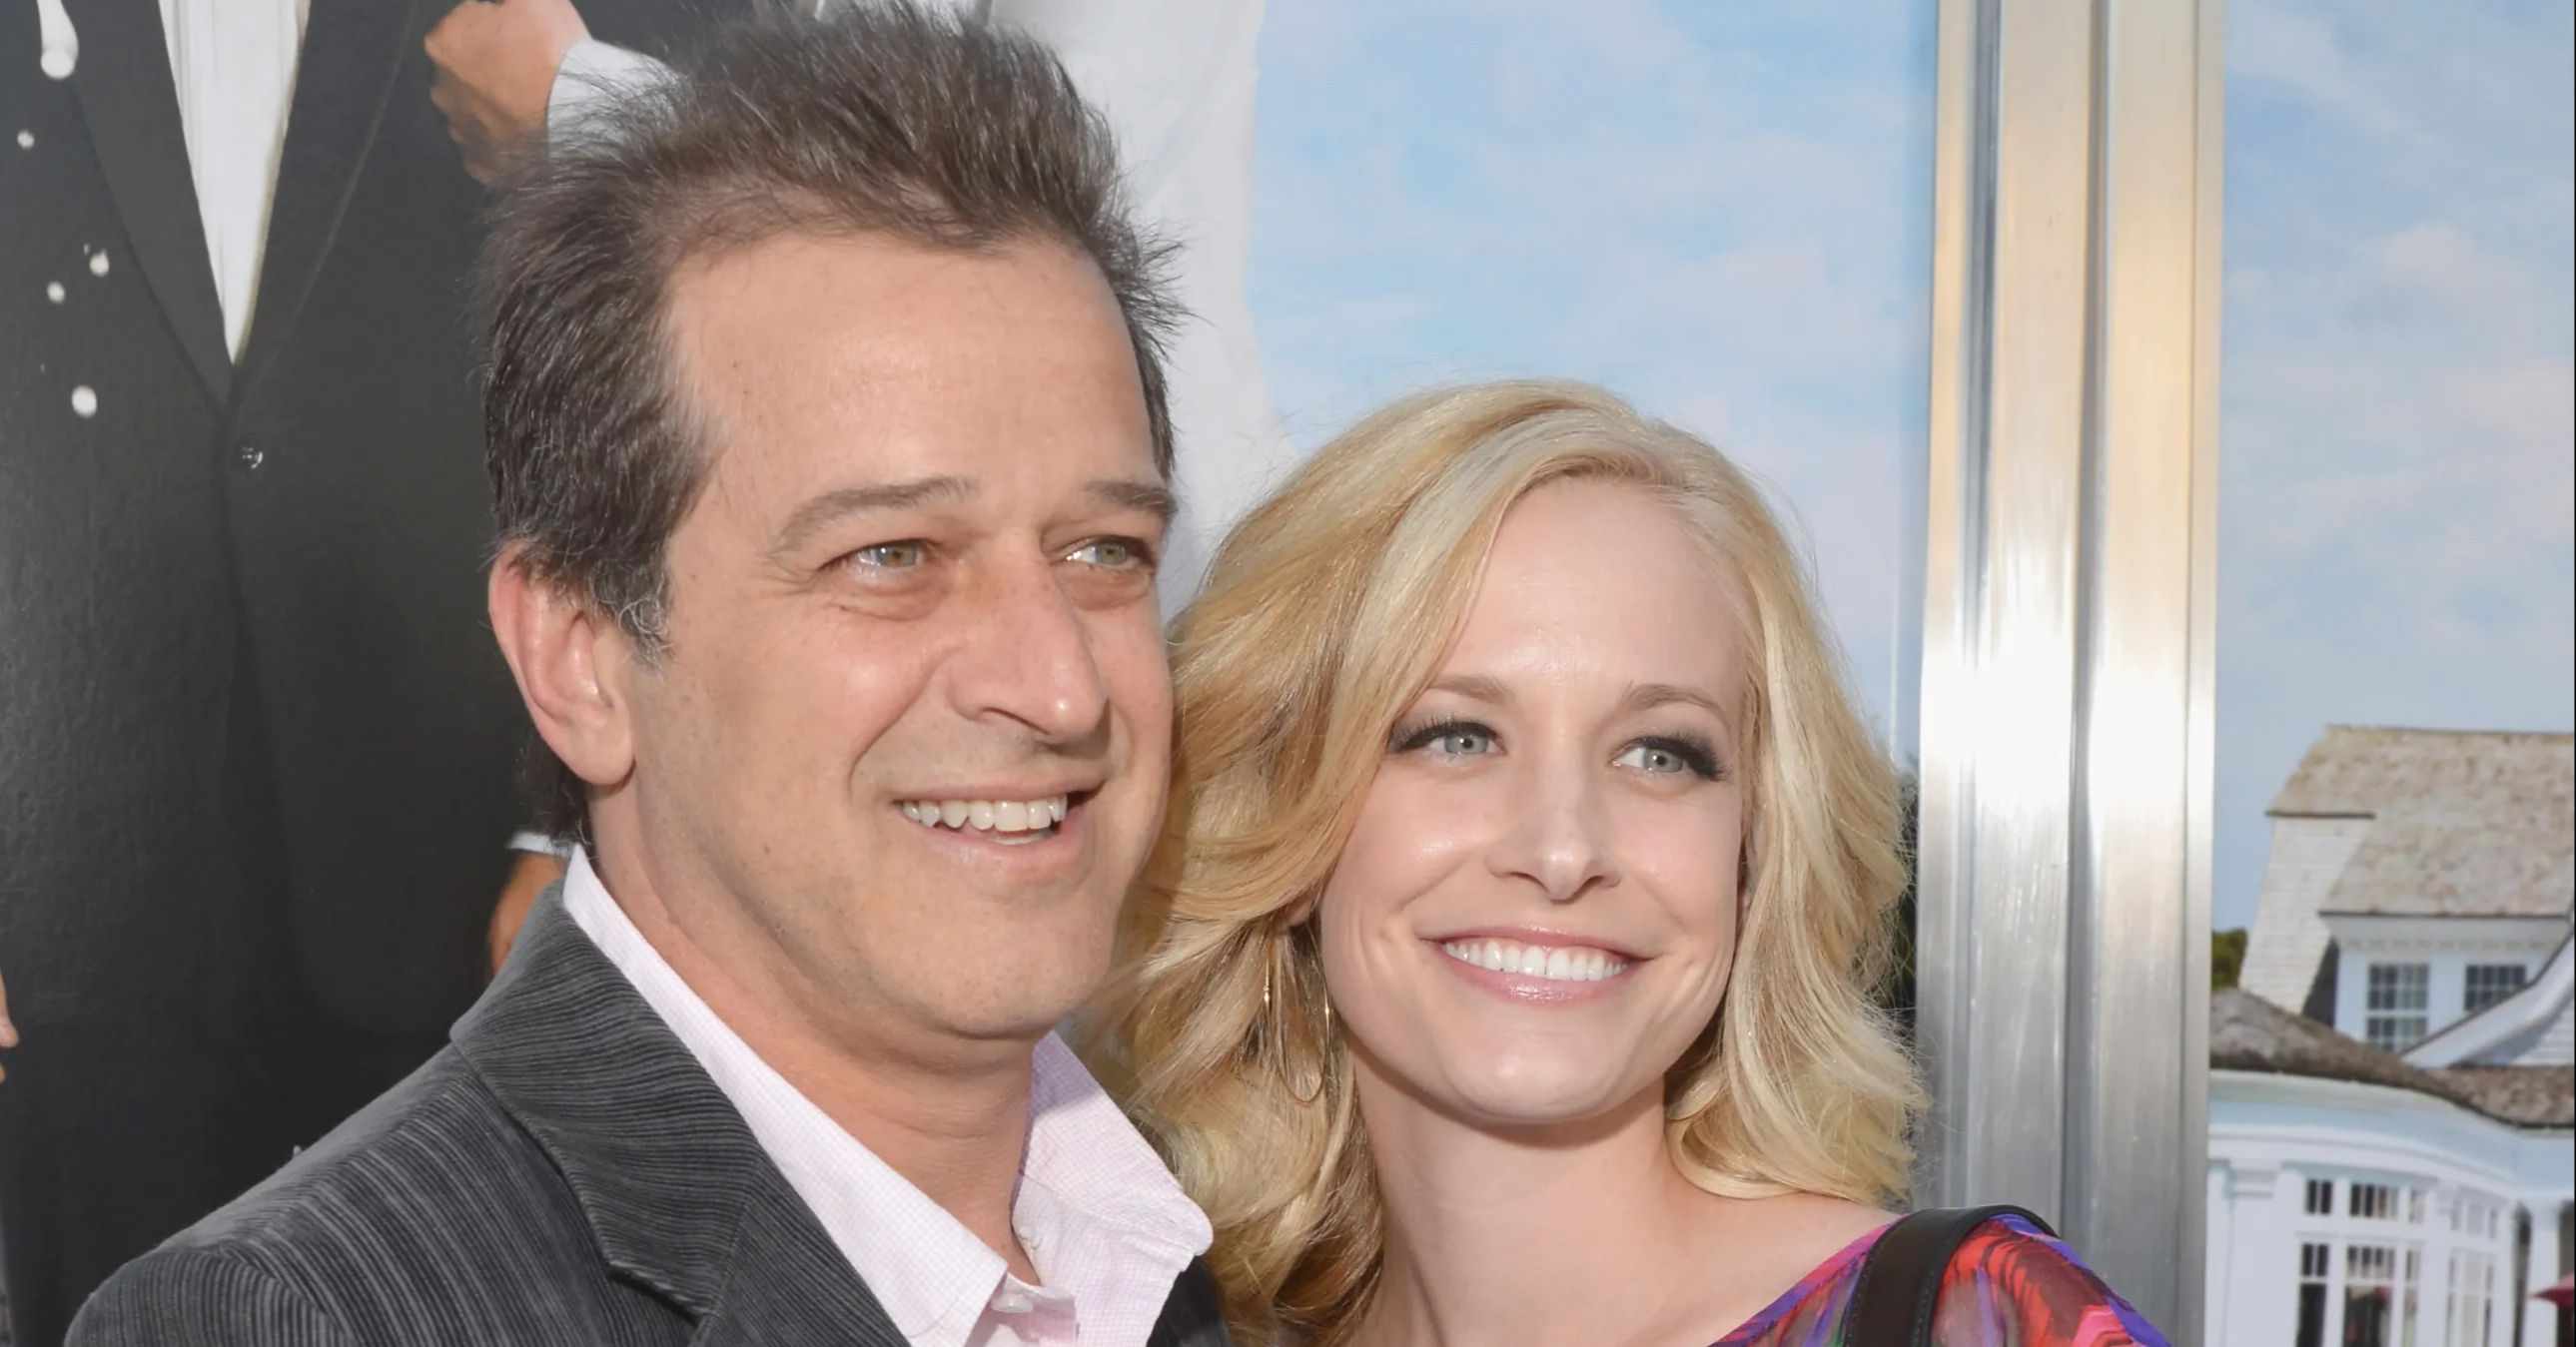 'Grandma's Boy' Star Allen Covert Gets Hit With Divorce ...